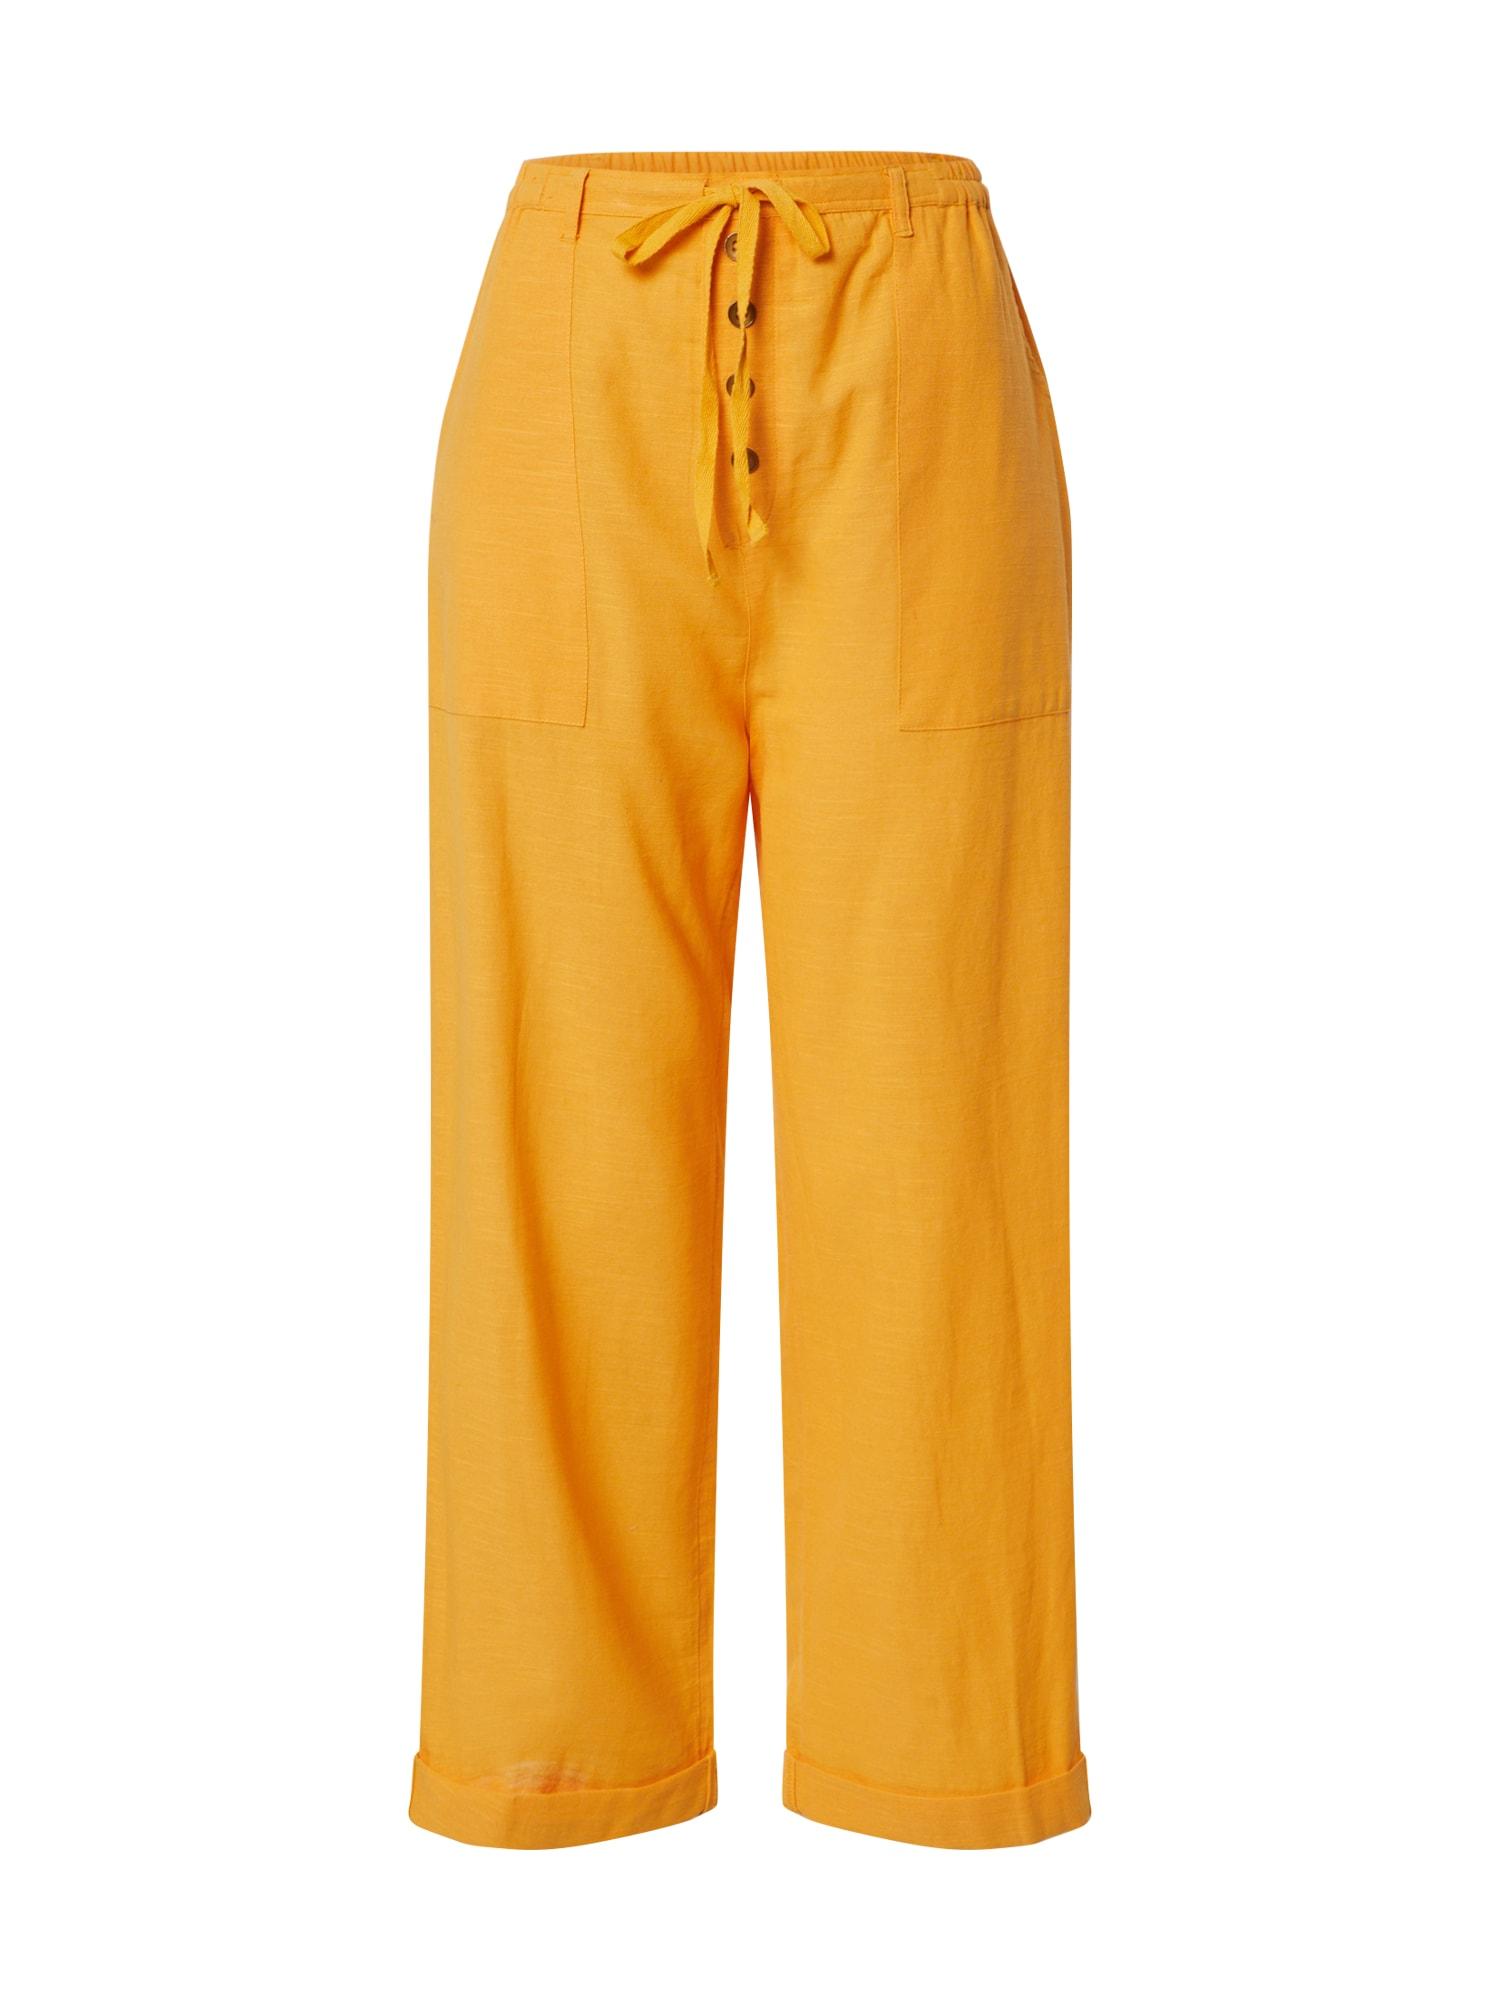 BILLABONG Kelnės 'Bring on' geltona